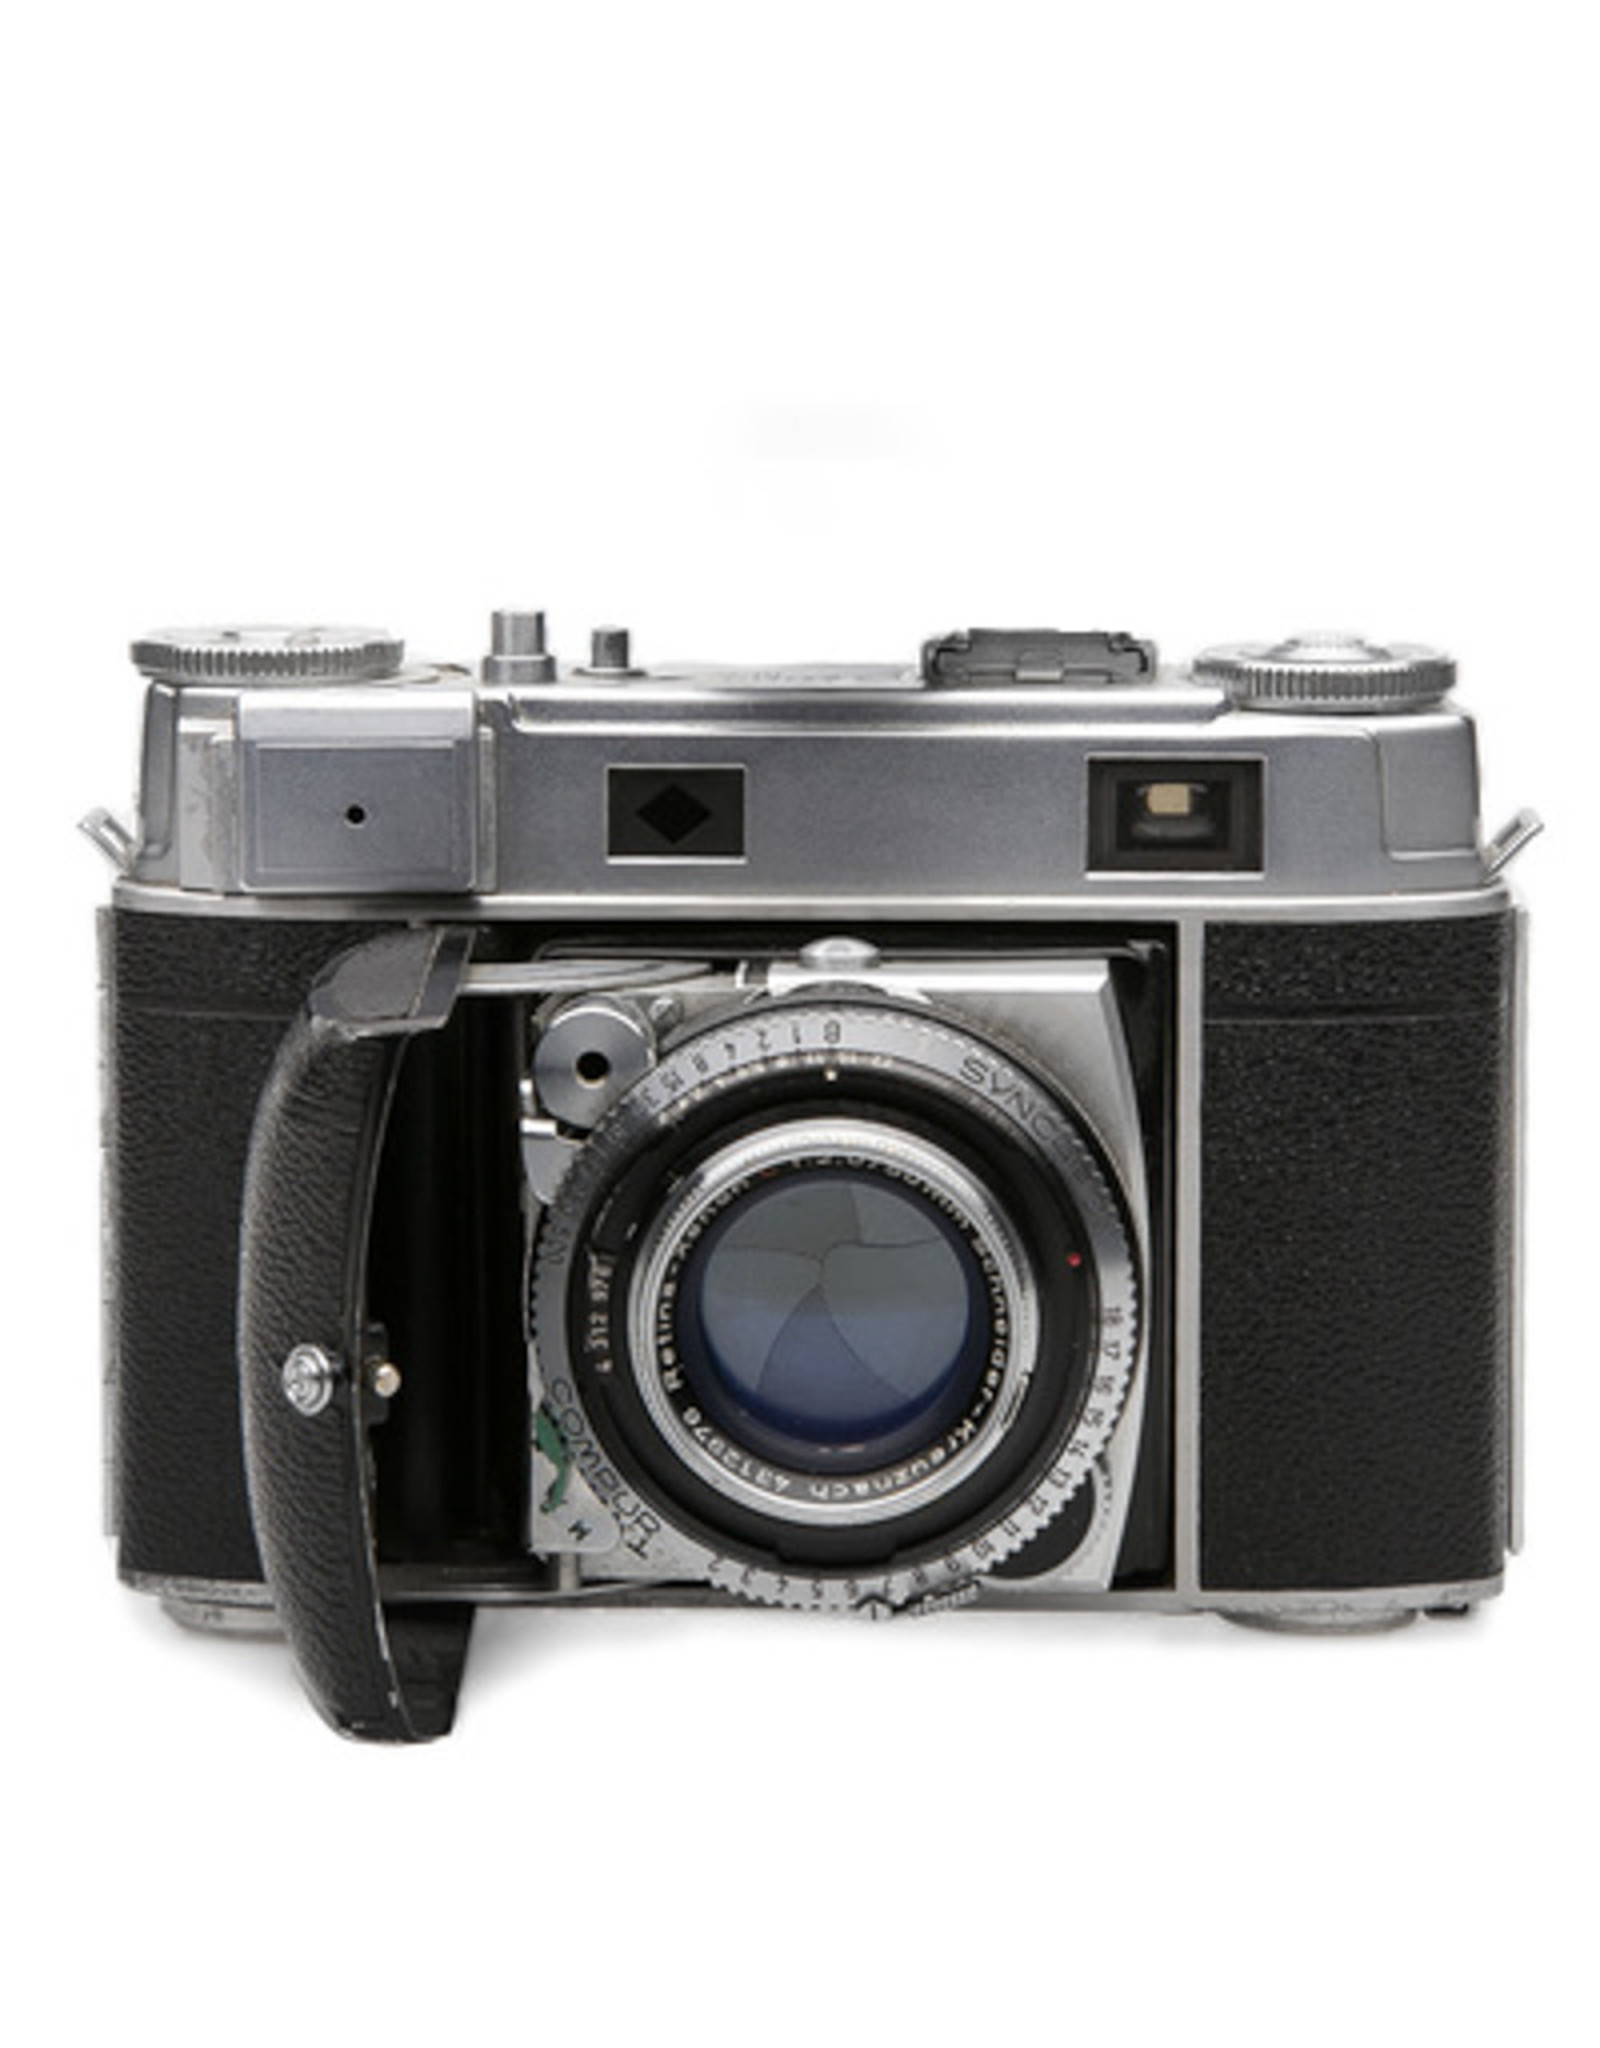 kodak Kodak Retina IIIc Rangefinder Camera w/case w/Xenon 50mm f2